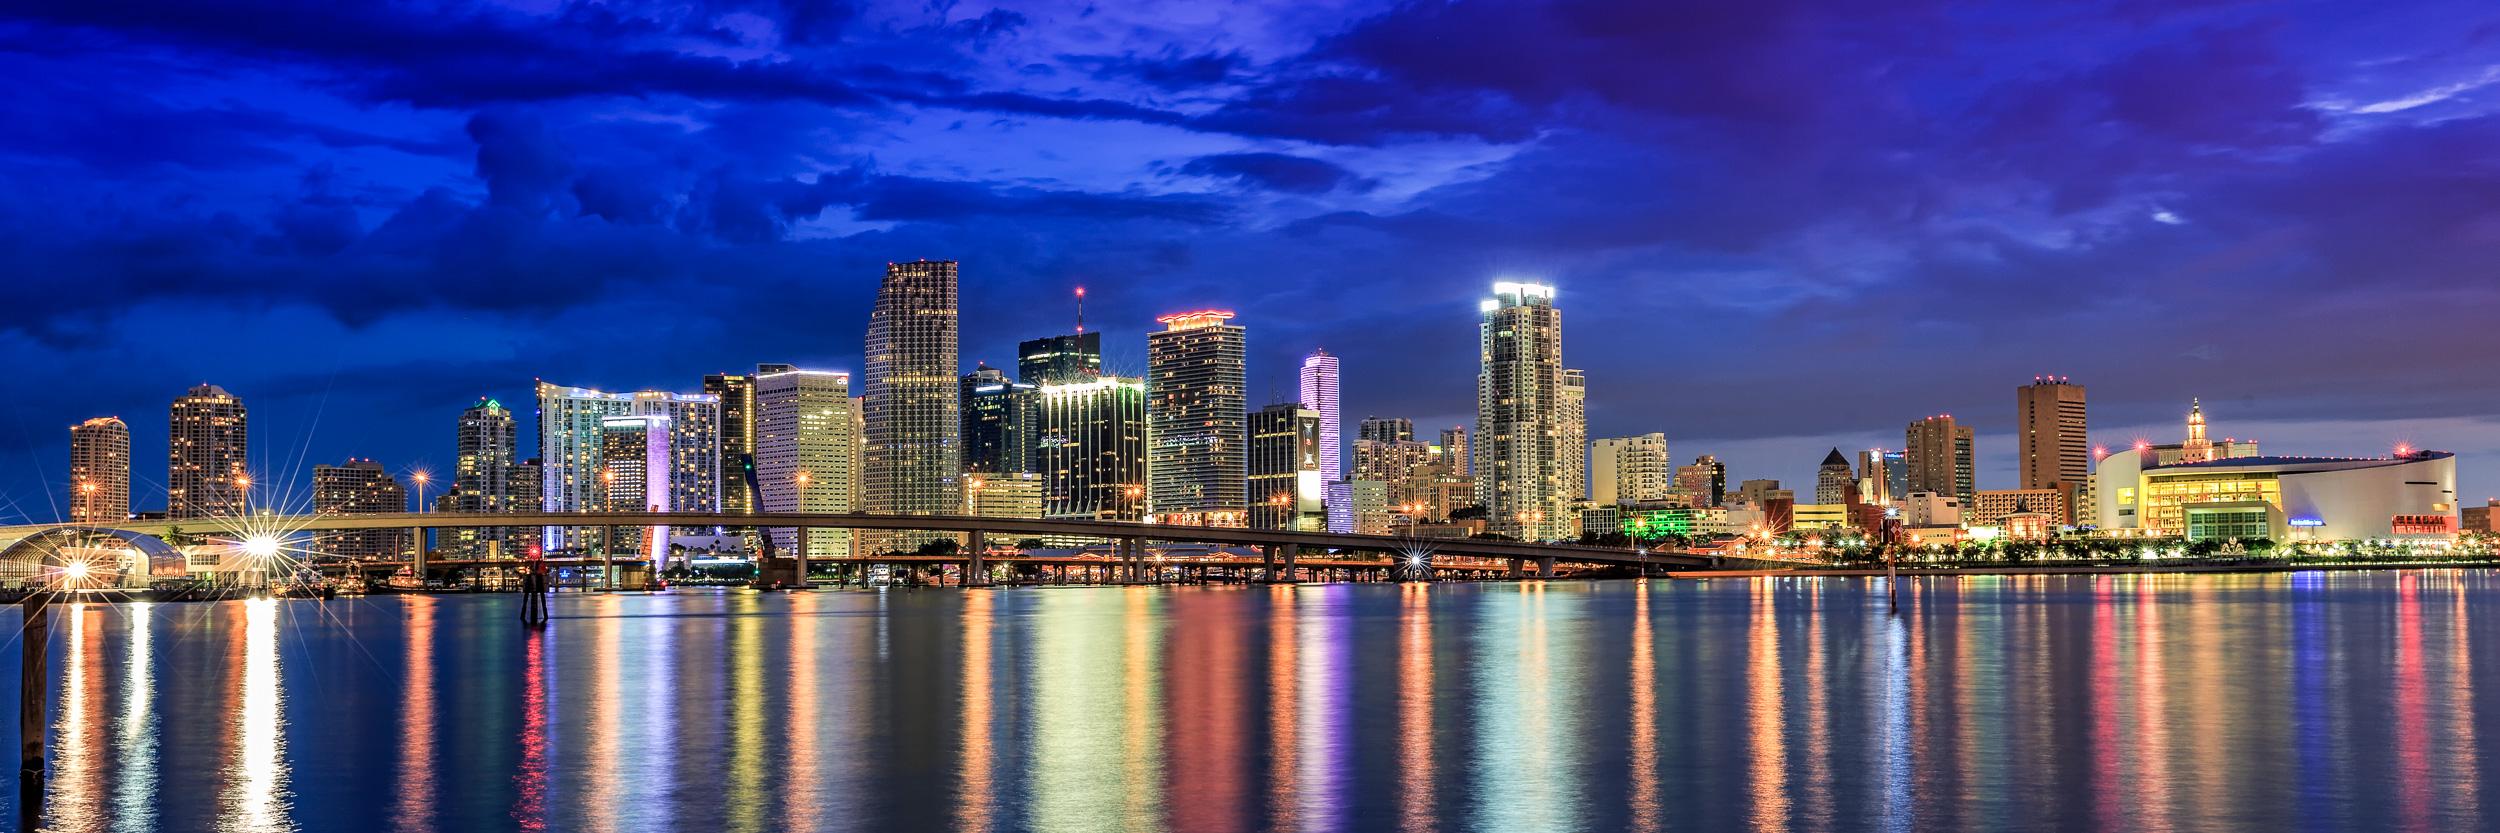 Miami_waterfront_night_Miami_Fort_Lauderdale_commercial_photographer_Franklin_Castillo.jpg